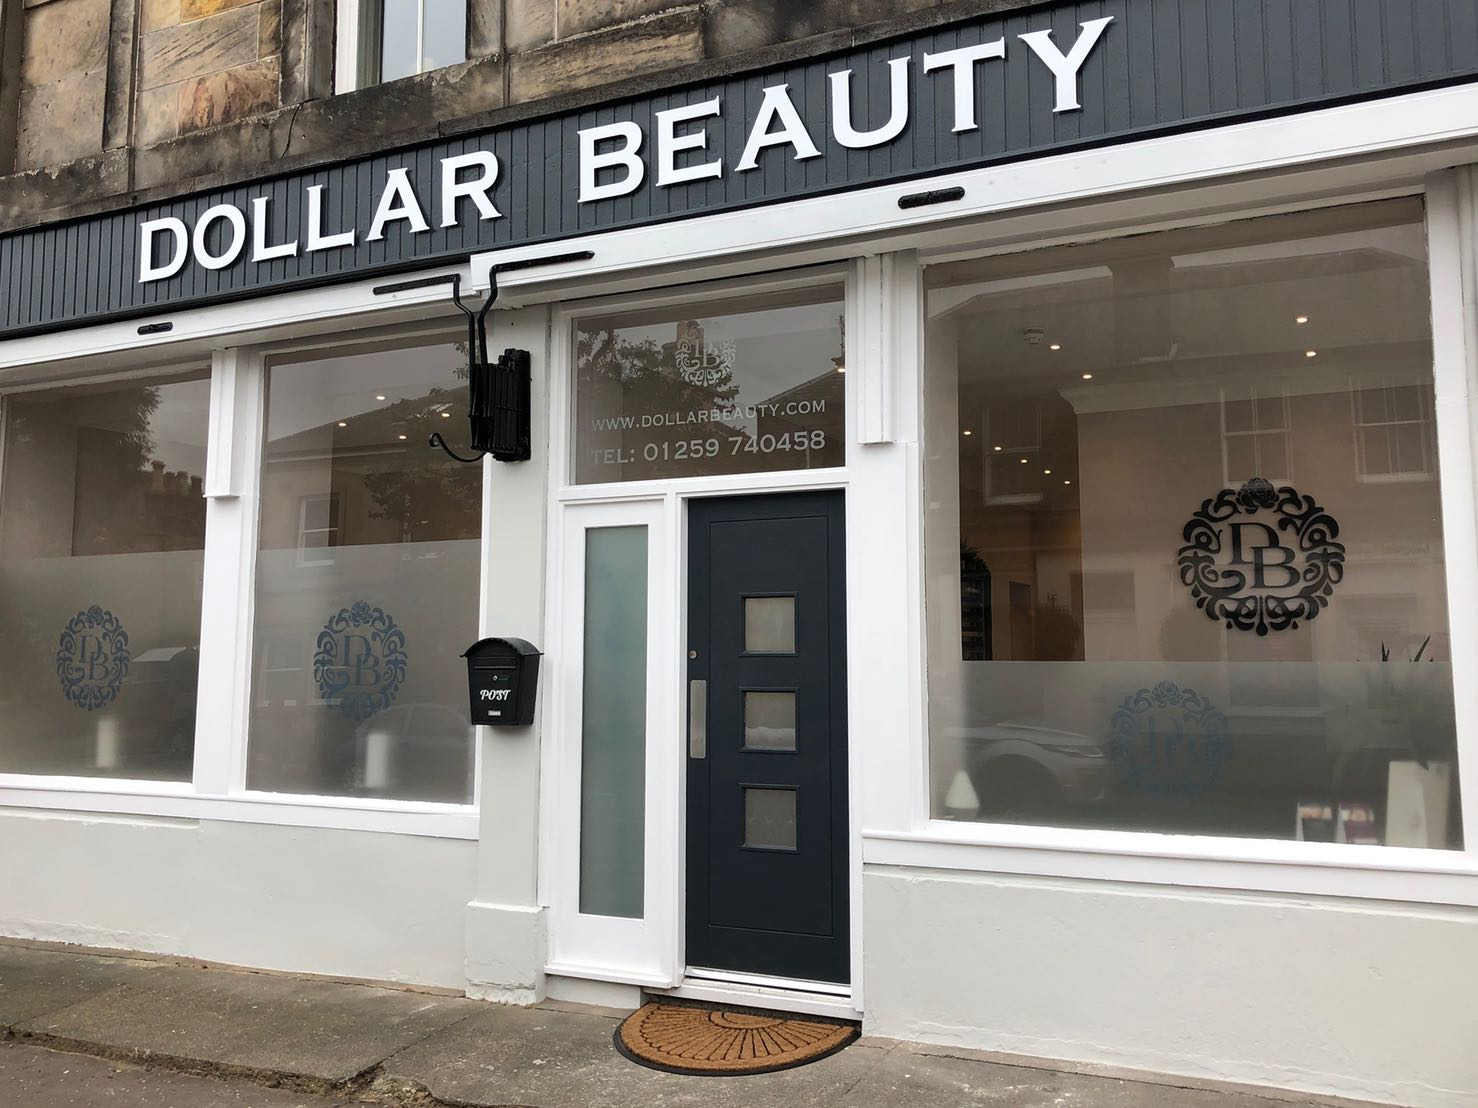 Dollar Beauty